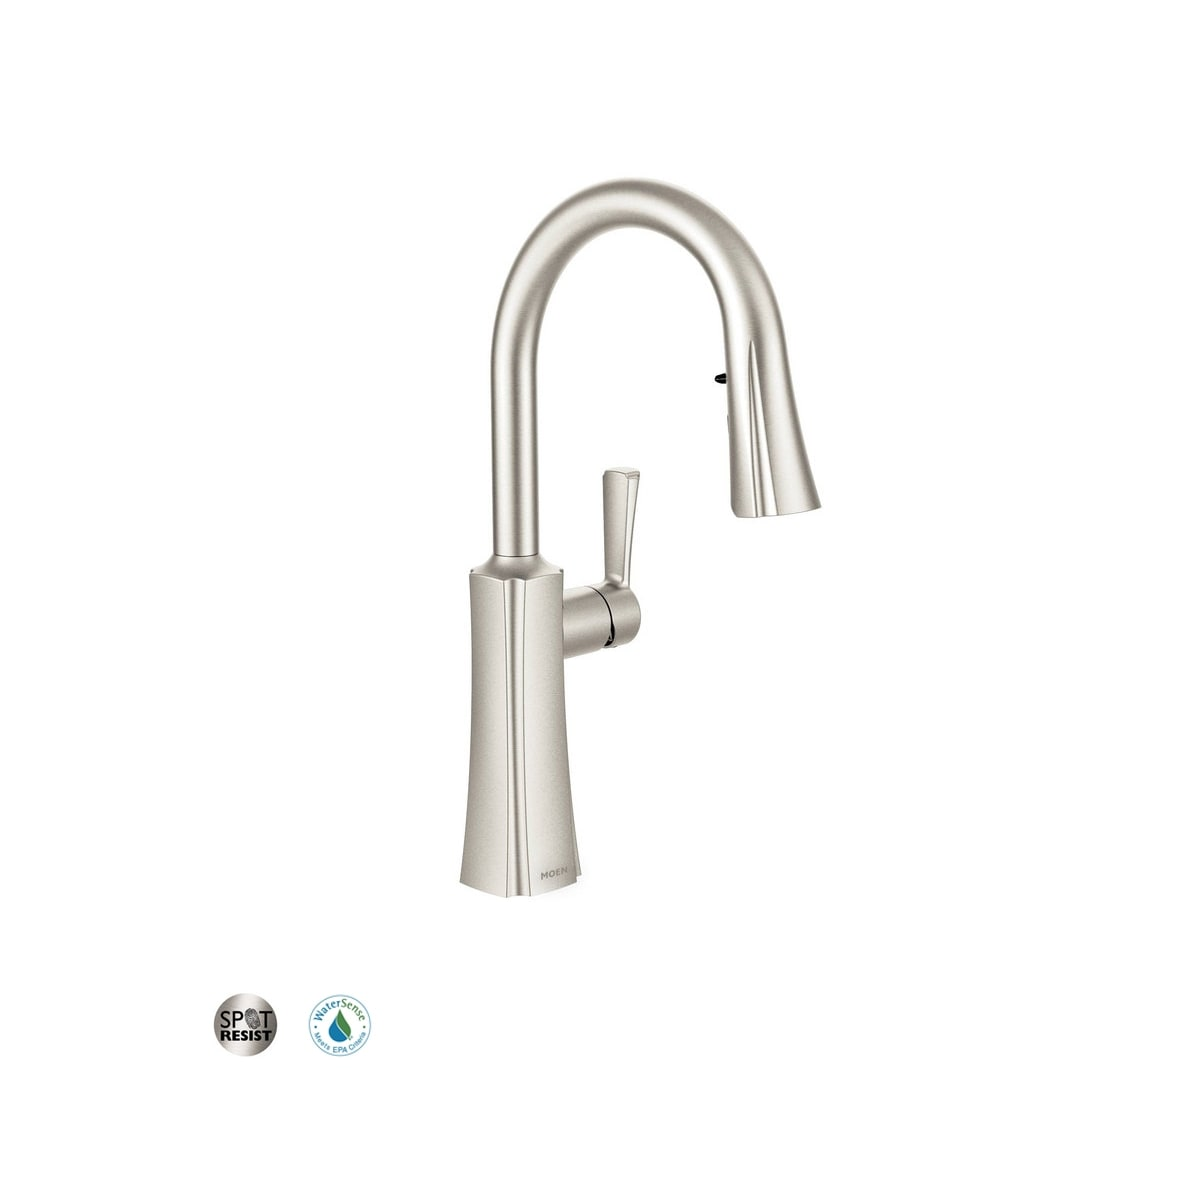 Home Improvement Pull Down Sprayer Kitchen Faucet Moen Single Handle 180 Spout Swivel Deck Mount Home Garden Mbln Org